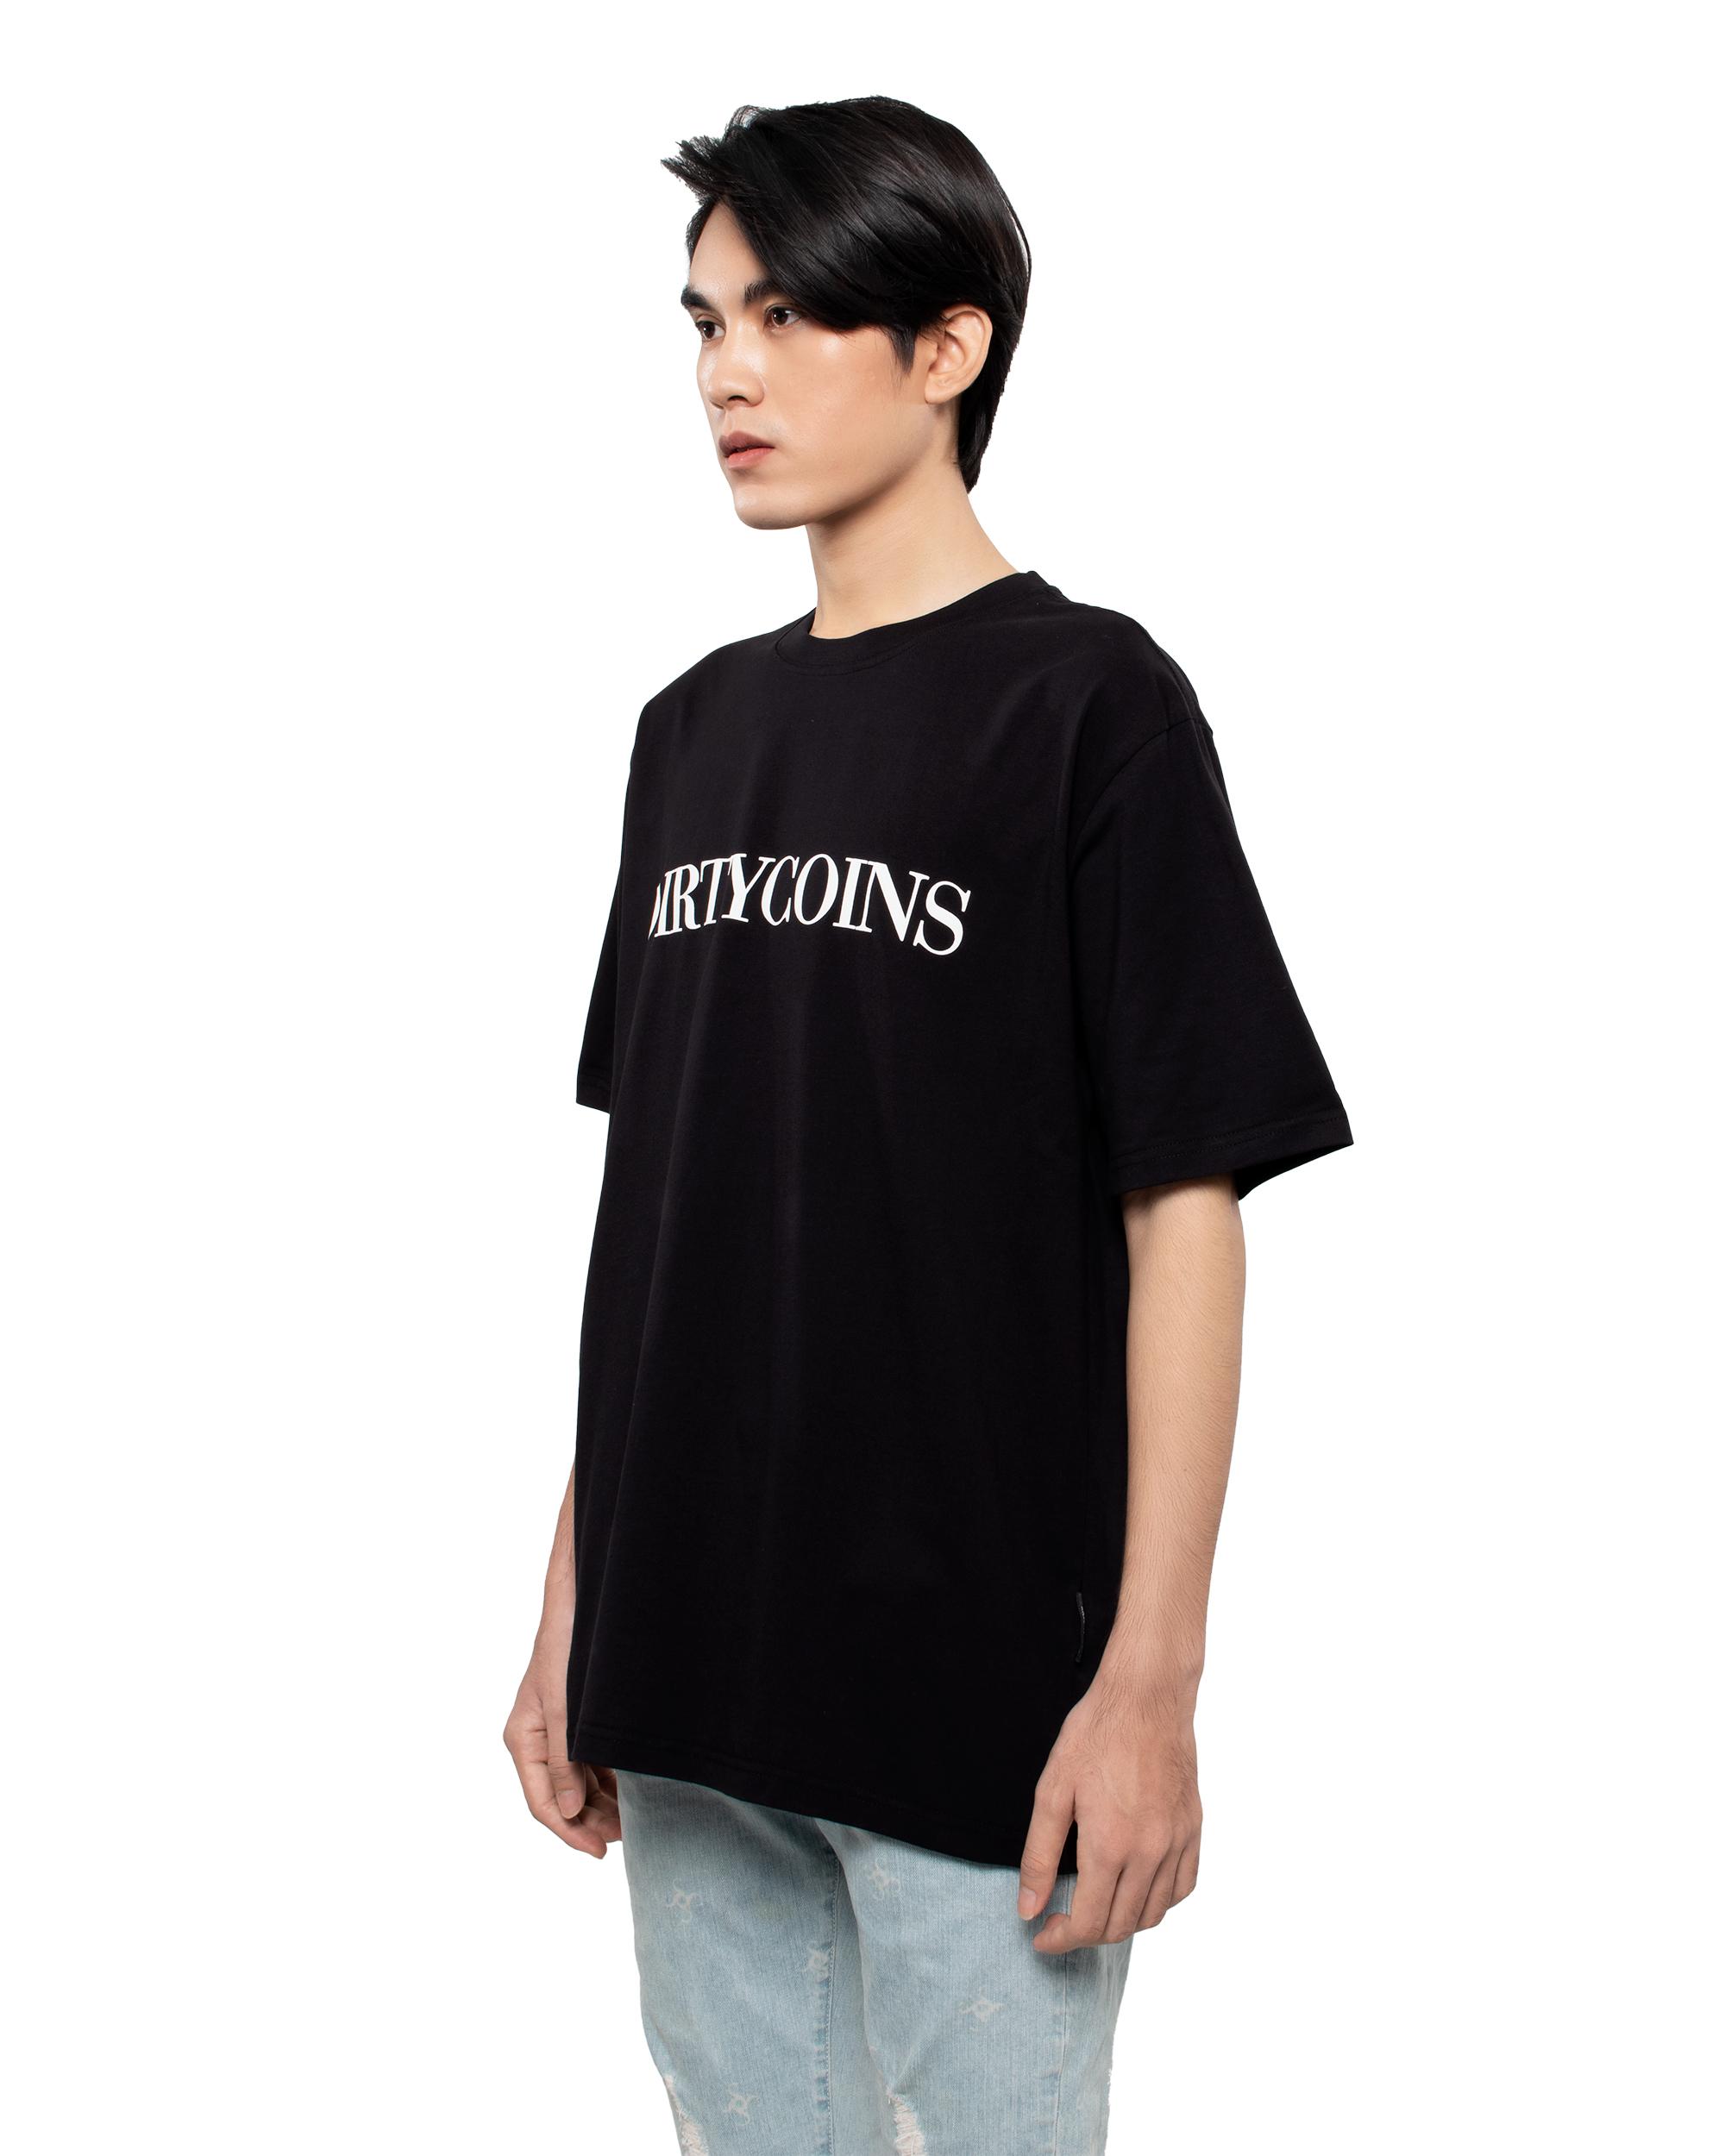 DirtyCoins Serif T-Shirt - Black